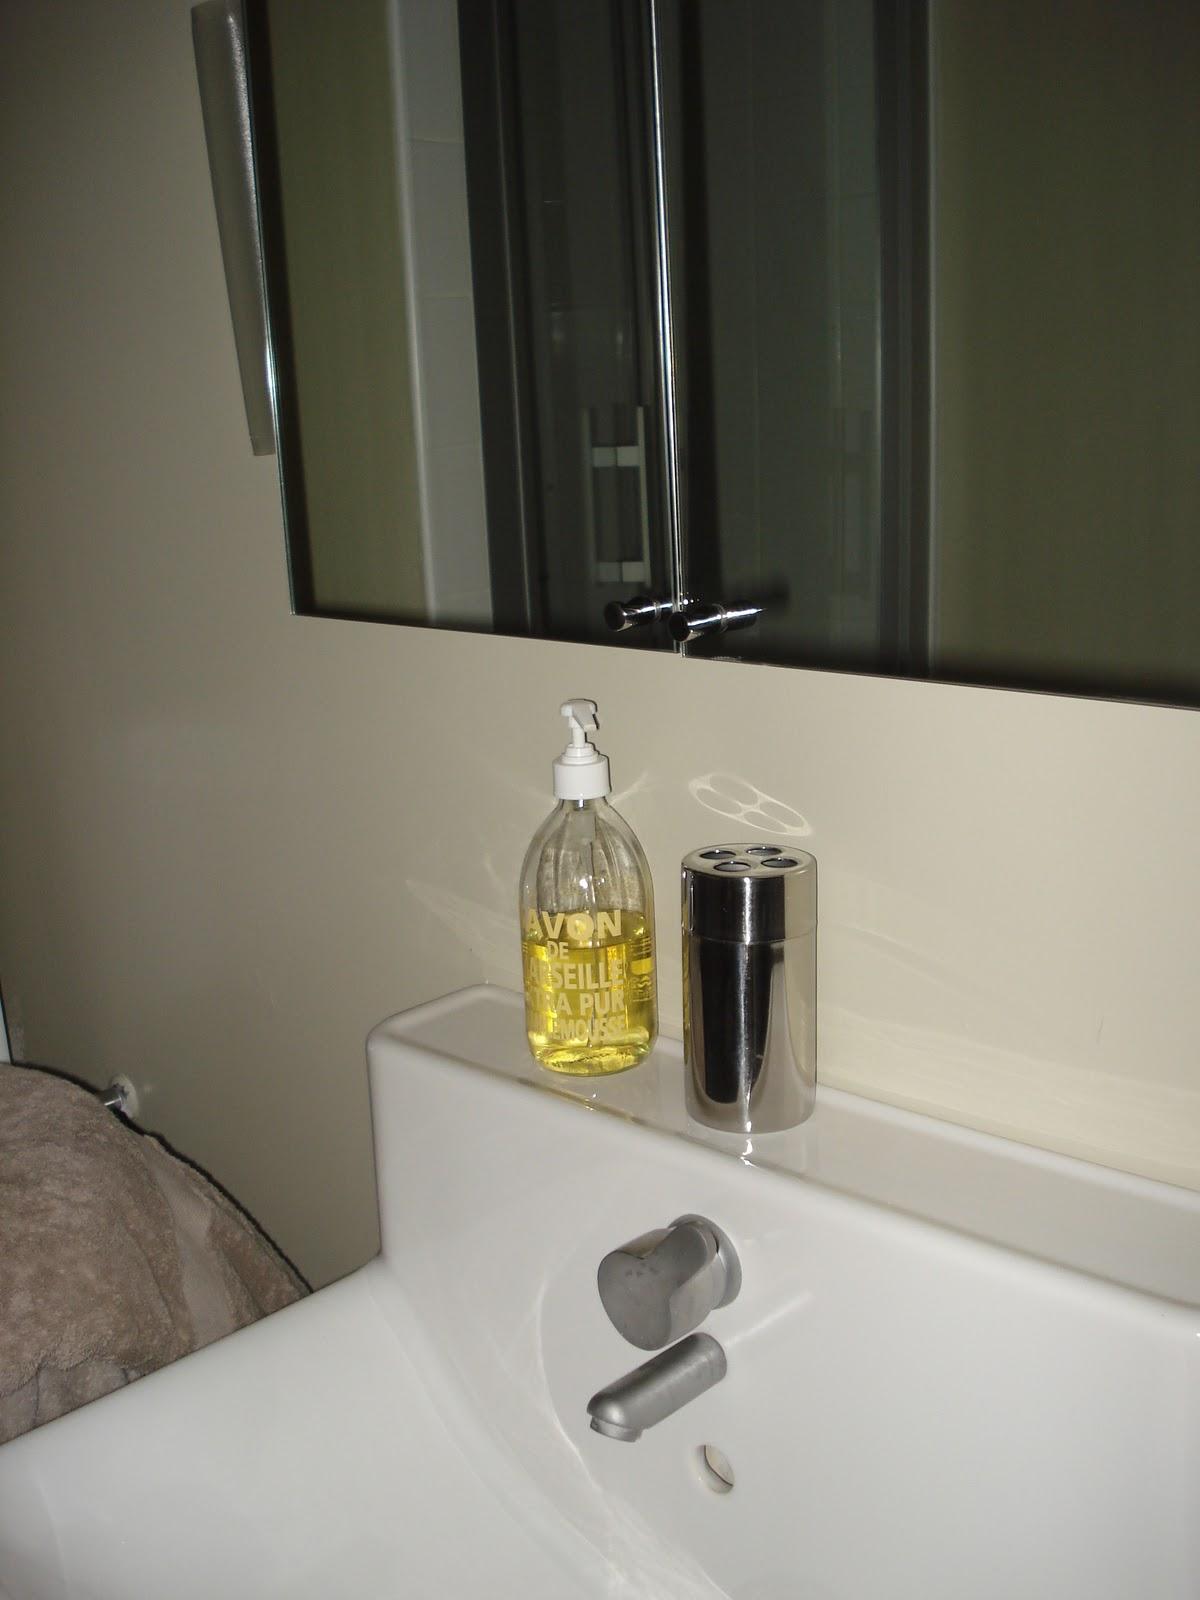 Salle De Bain Saumon gris souris: chantier salle de bain